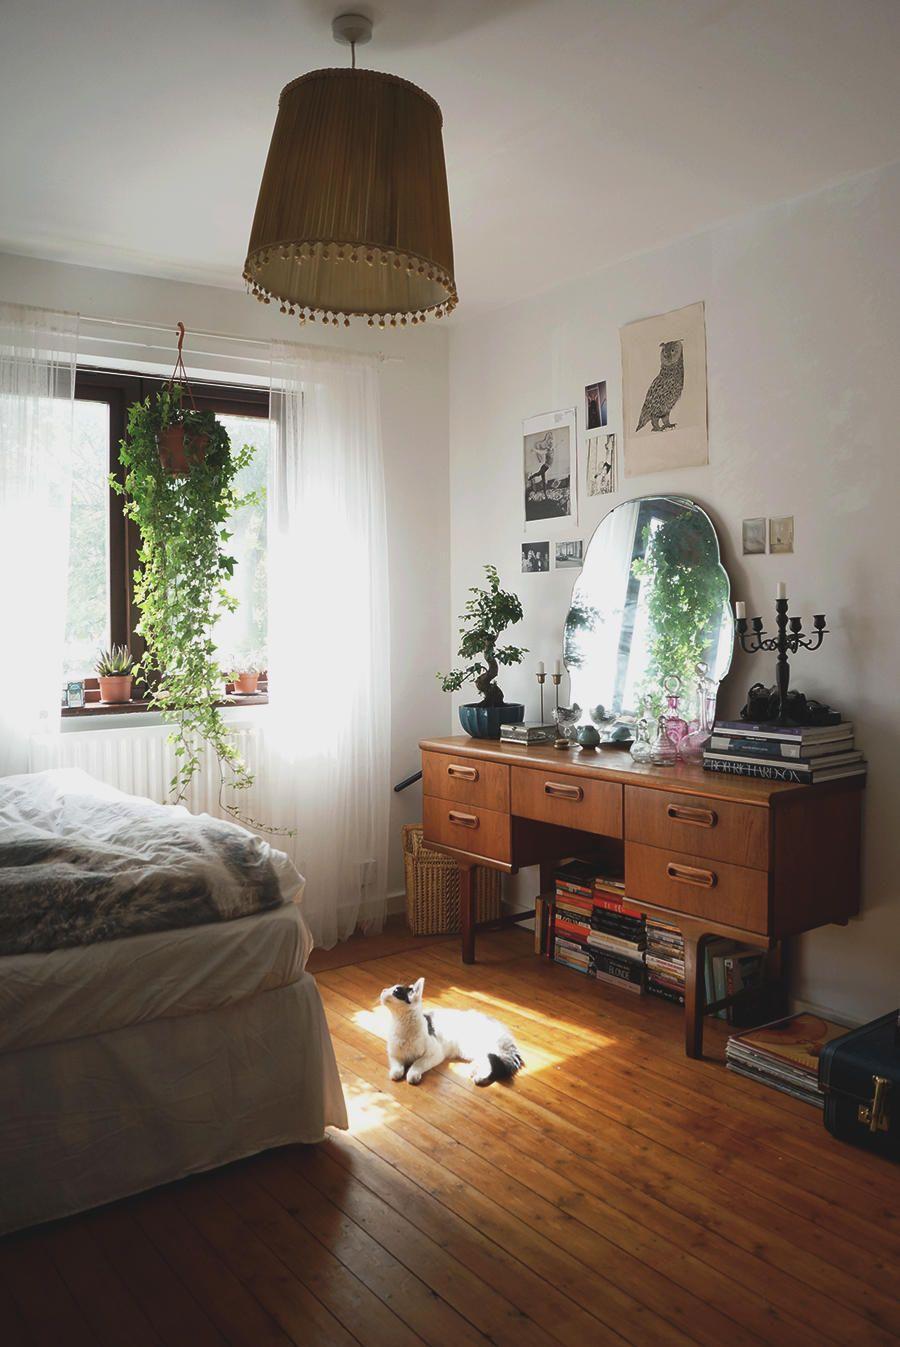 My room (Lovisa Ranta) | Nuggwifee, Bedrooms and White paints